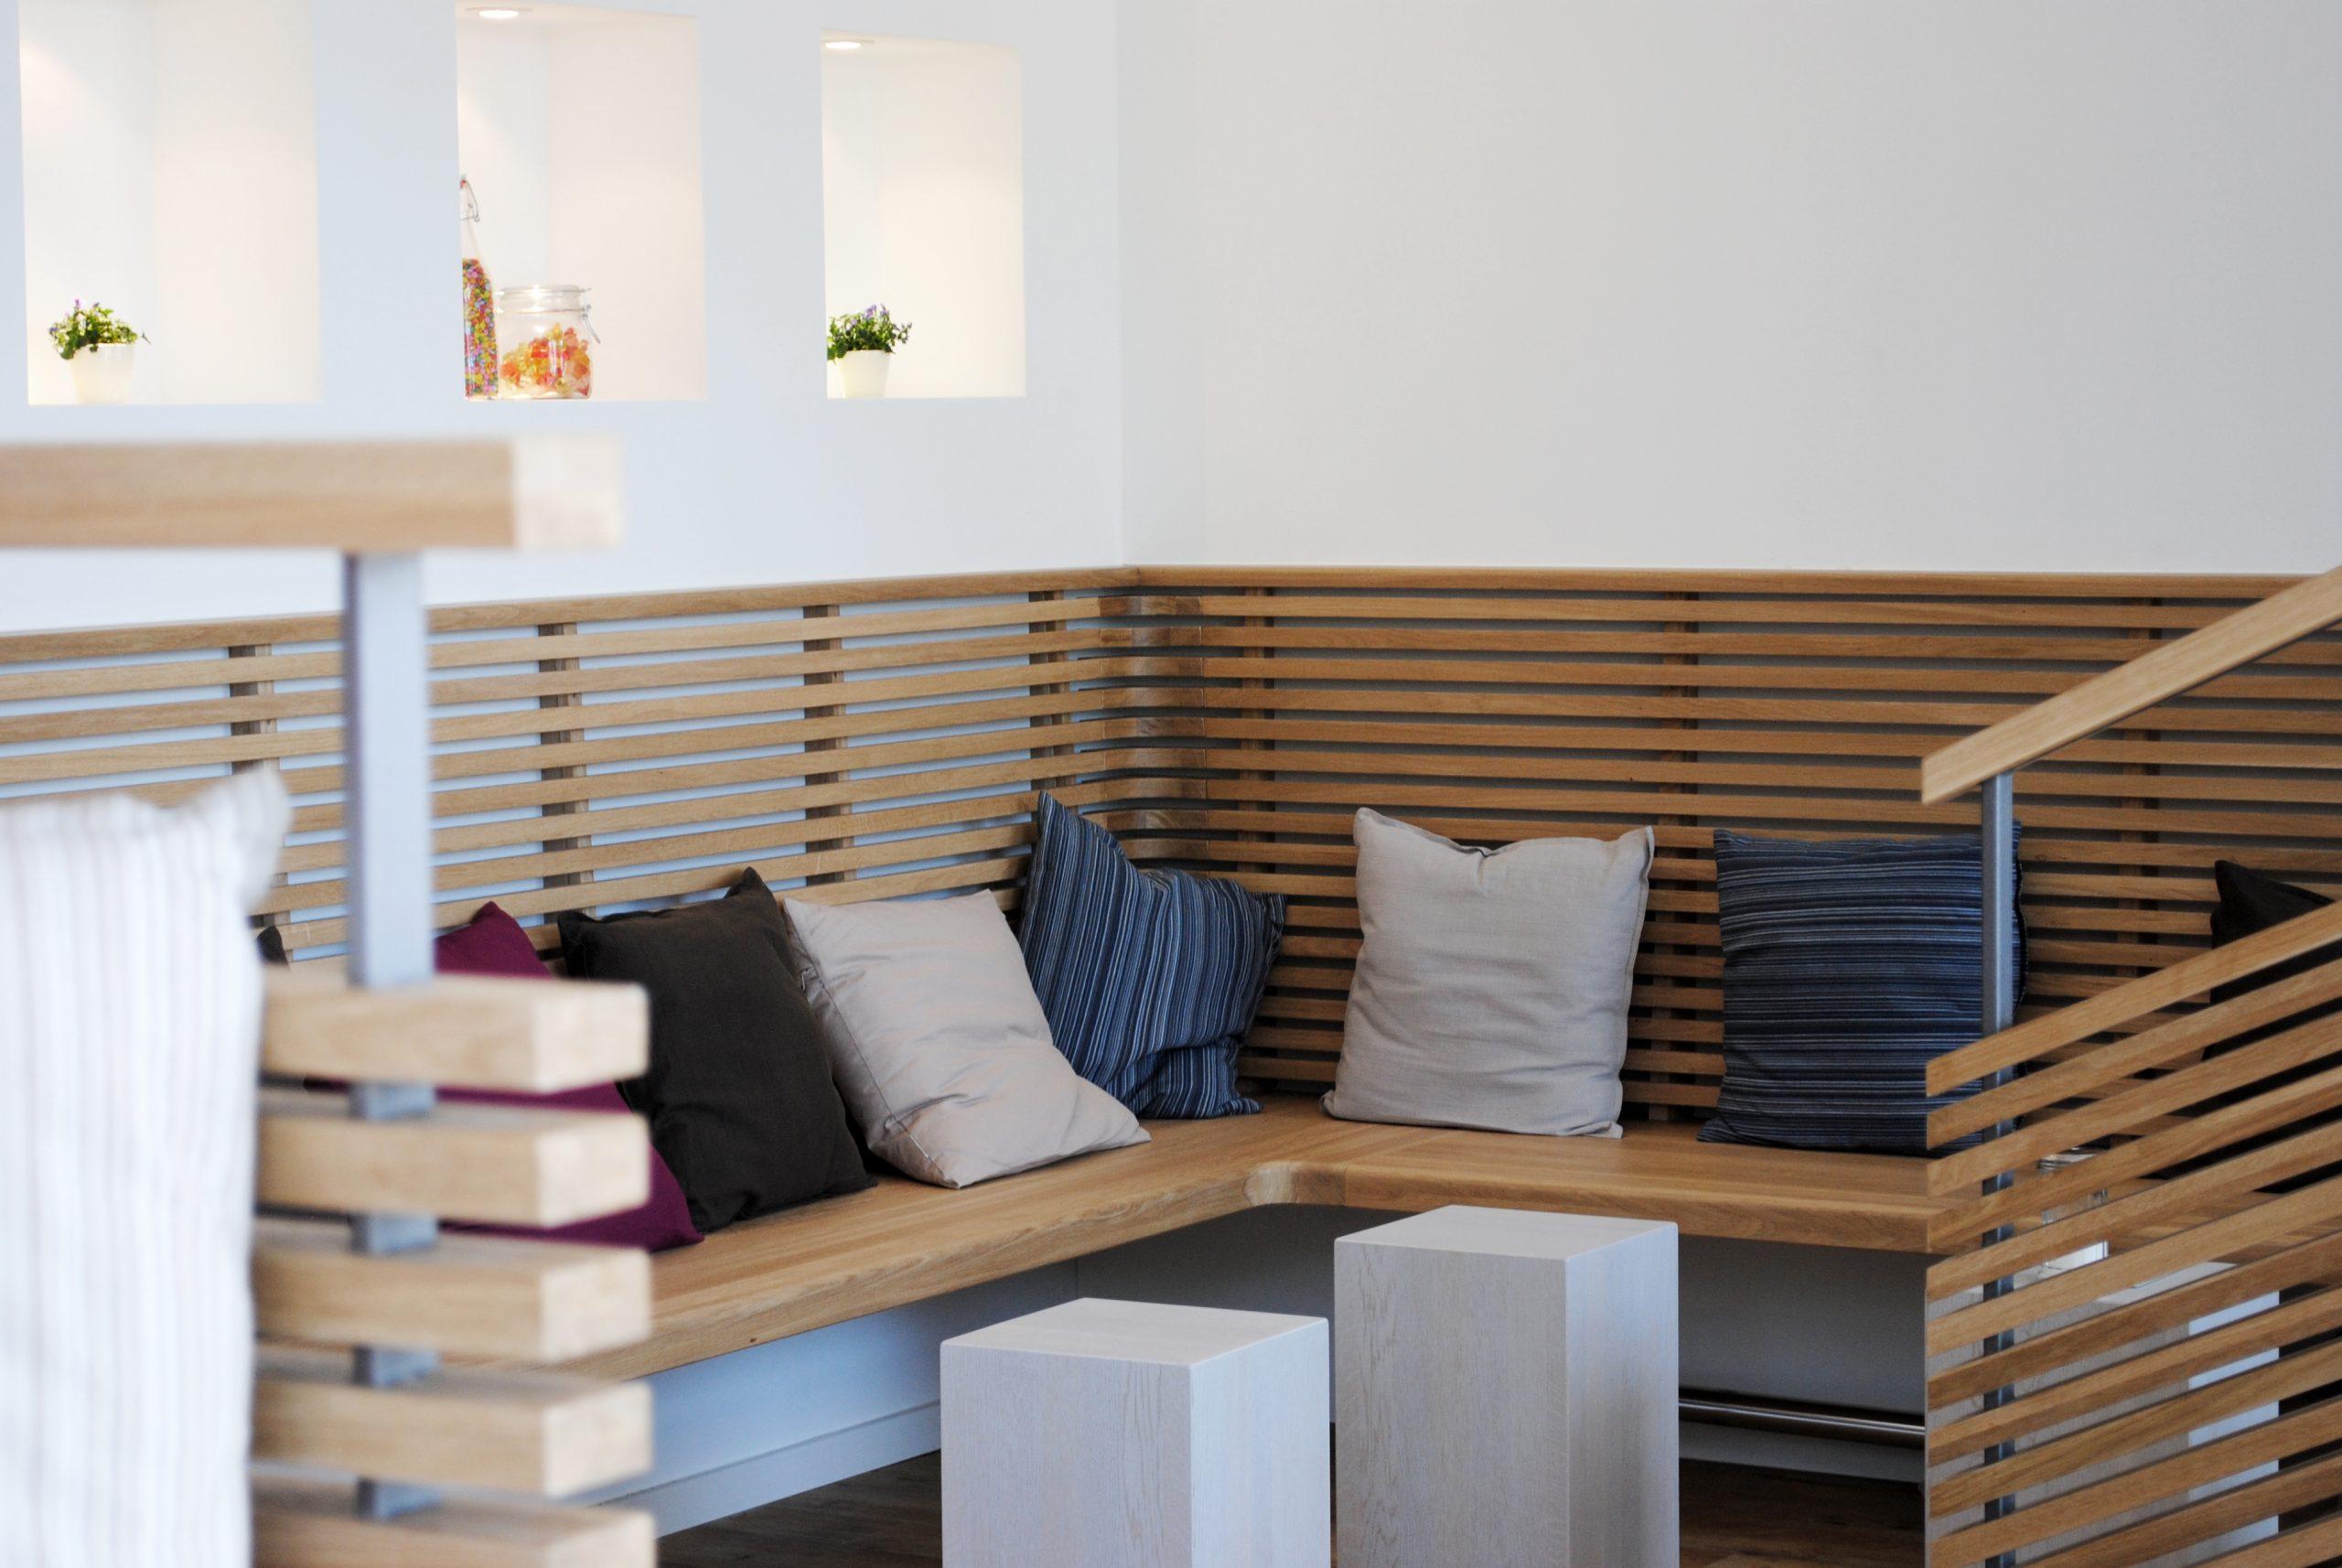 jacob-mayer-voigt-architekt-interior-design-sitzecke-sitzbank-holz